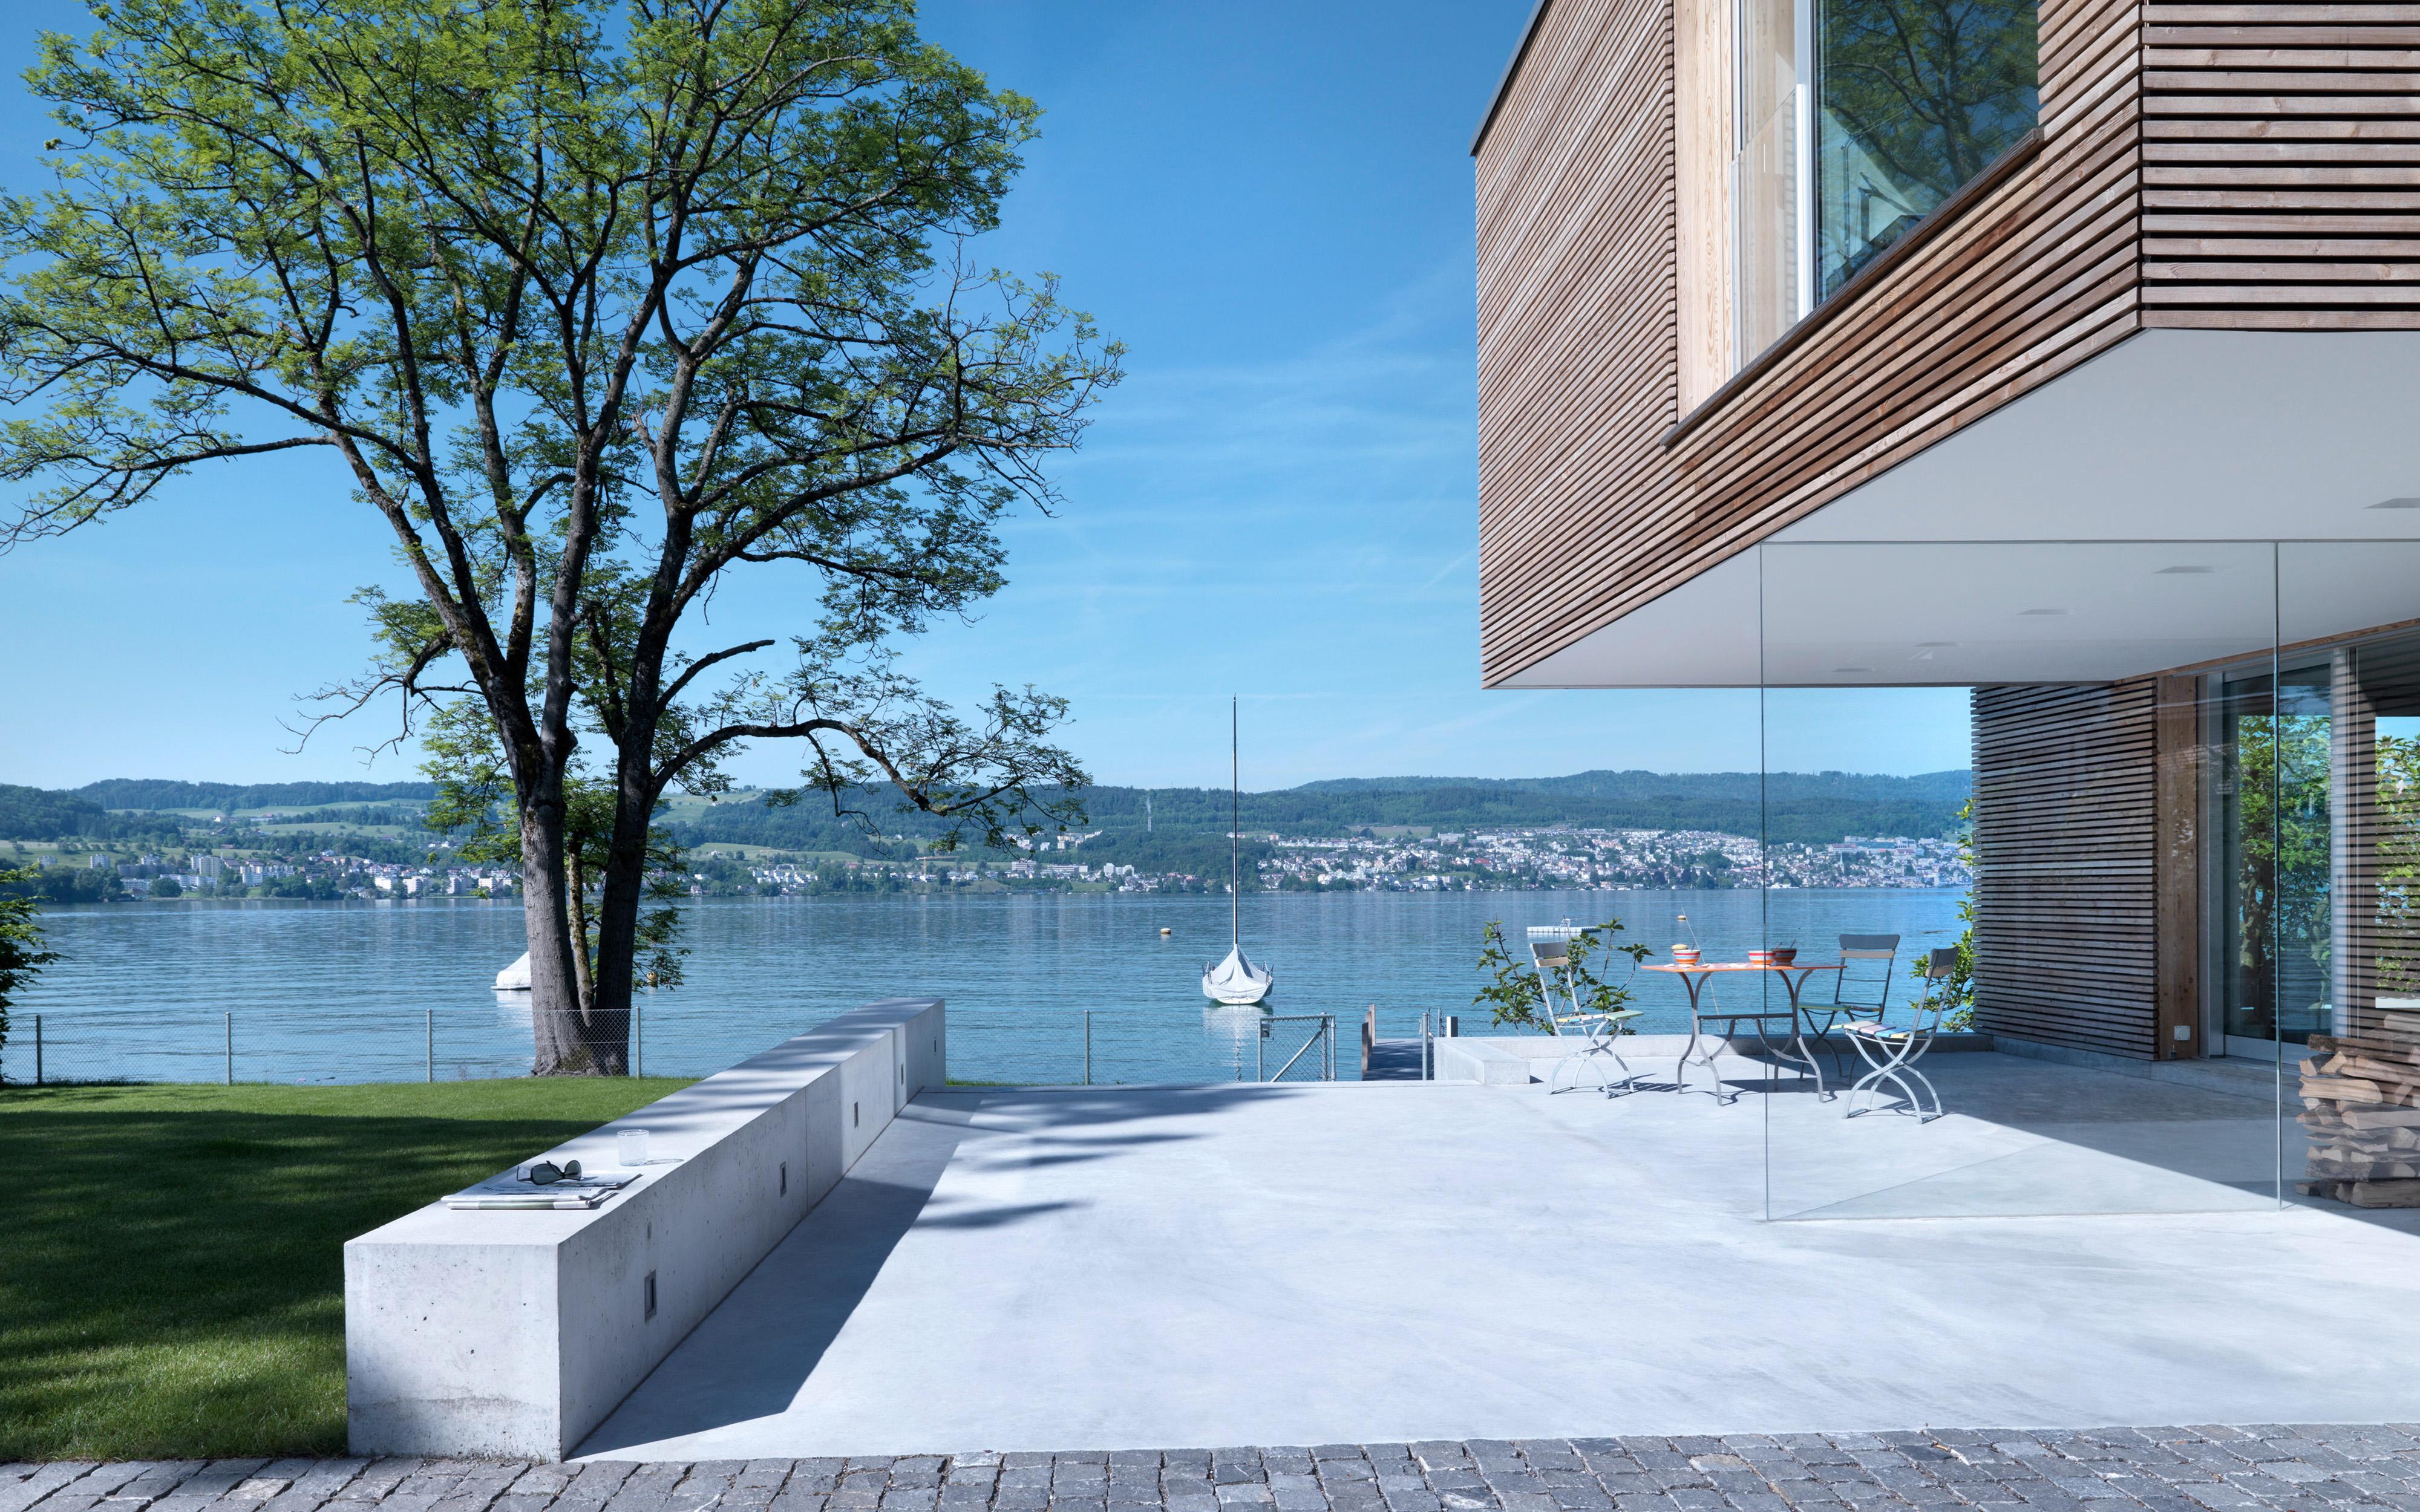 Projects | M3 Architekten